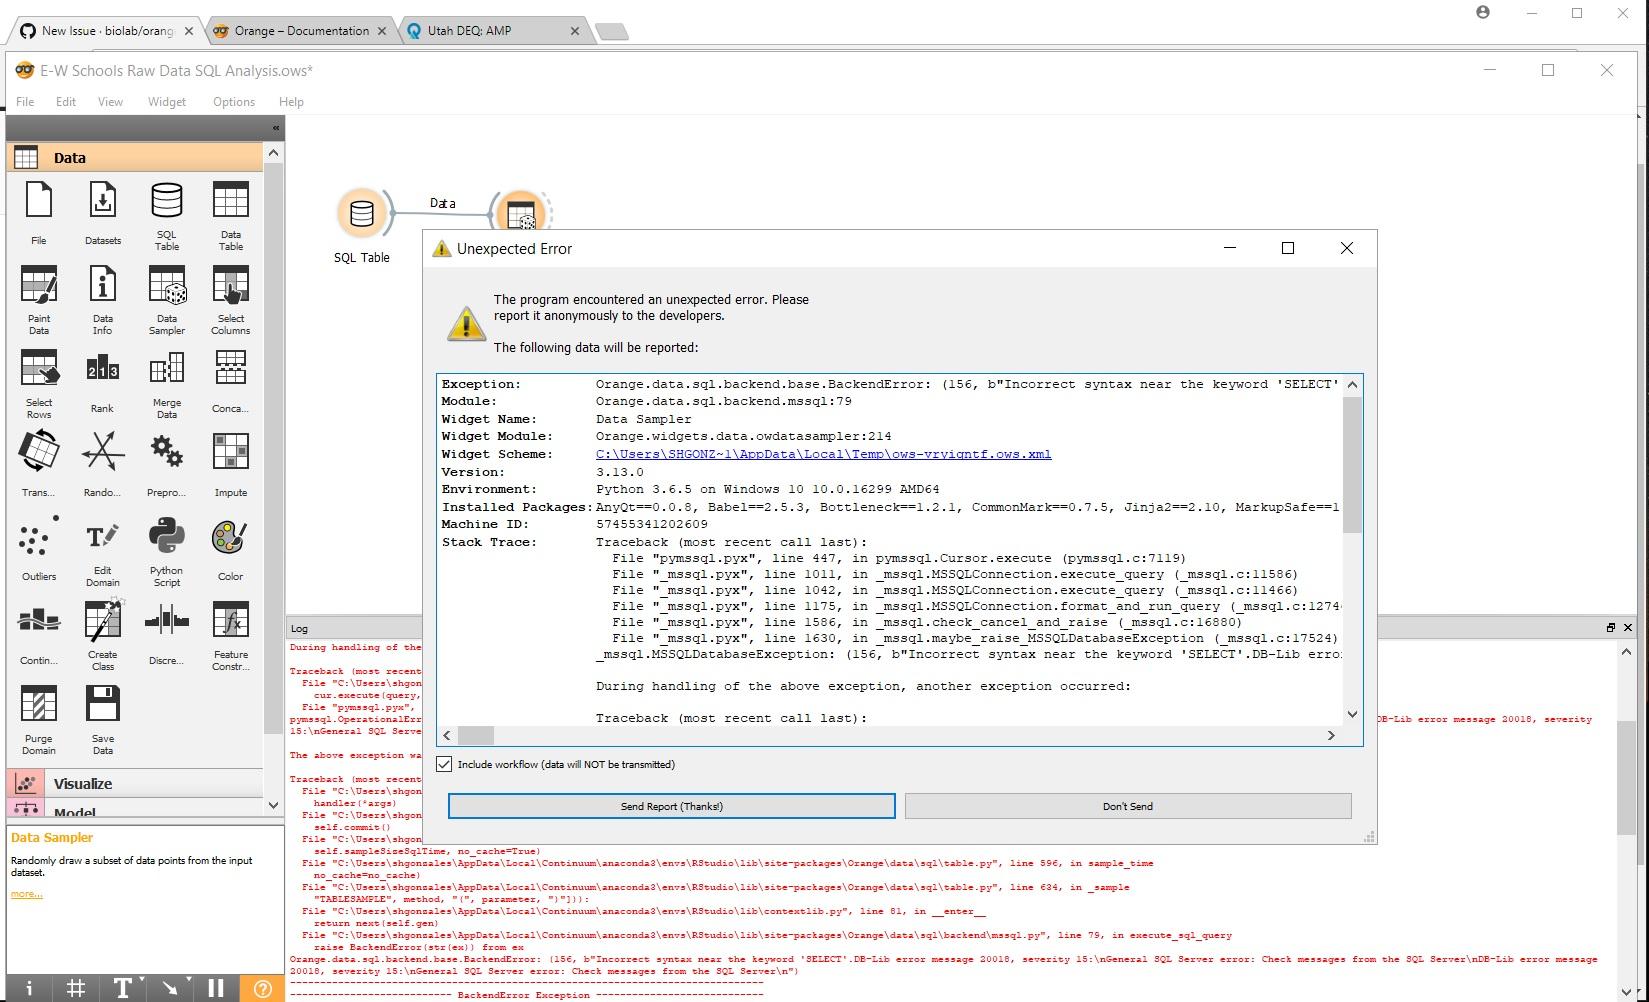 Sql Db Access Error Using Widgets In Orange 3 13 Issue